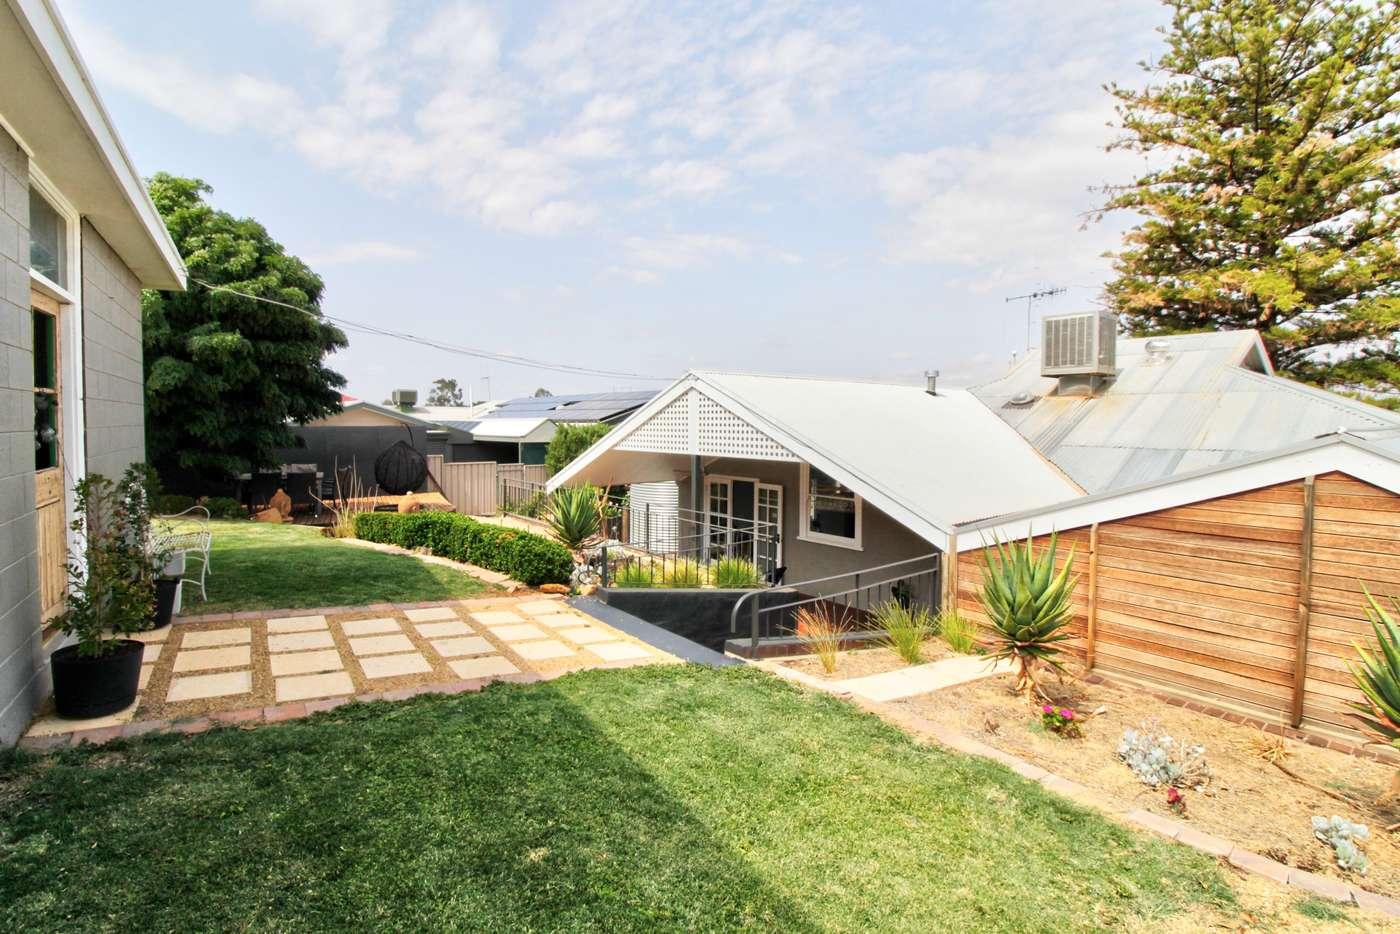 Main view of Homely house listing, 39 Powell Street, Berri SA 5343